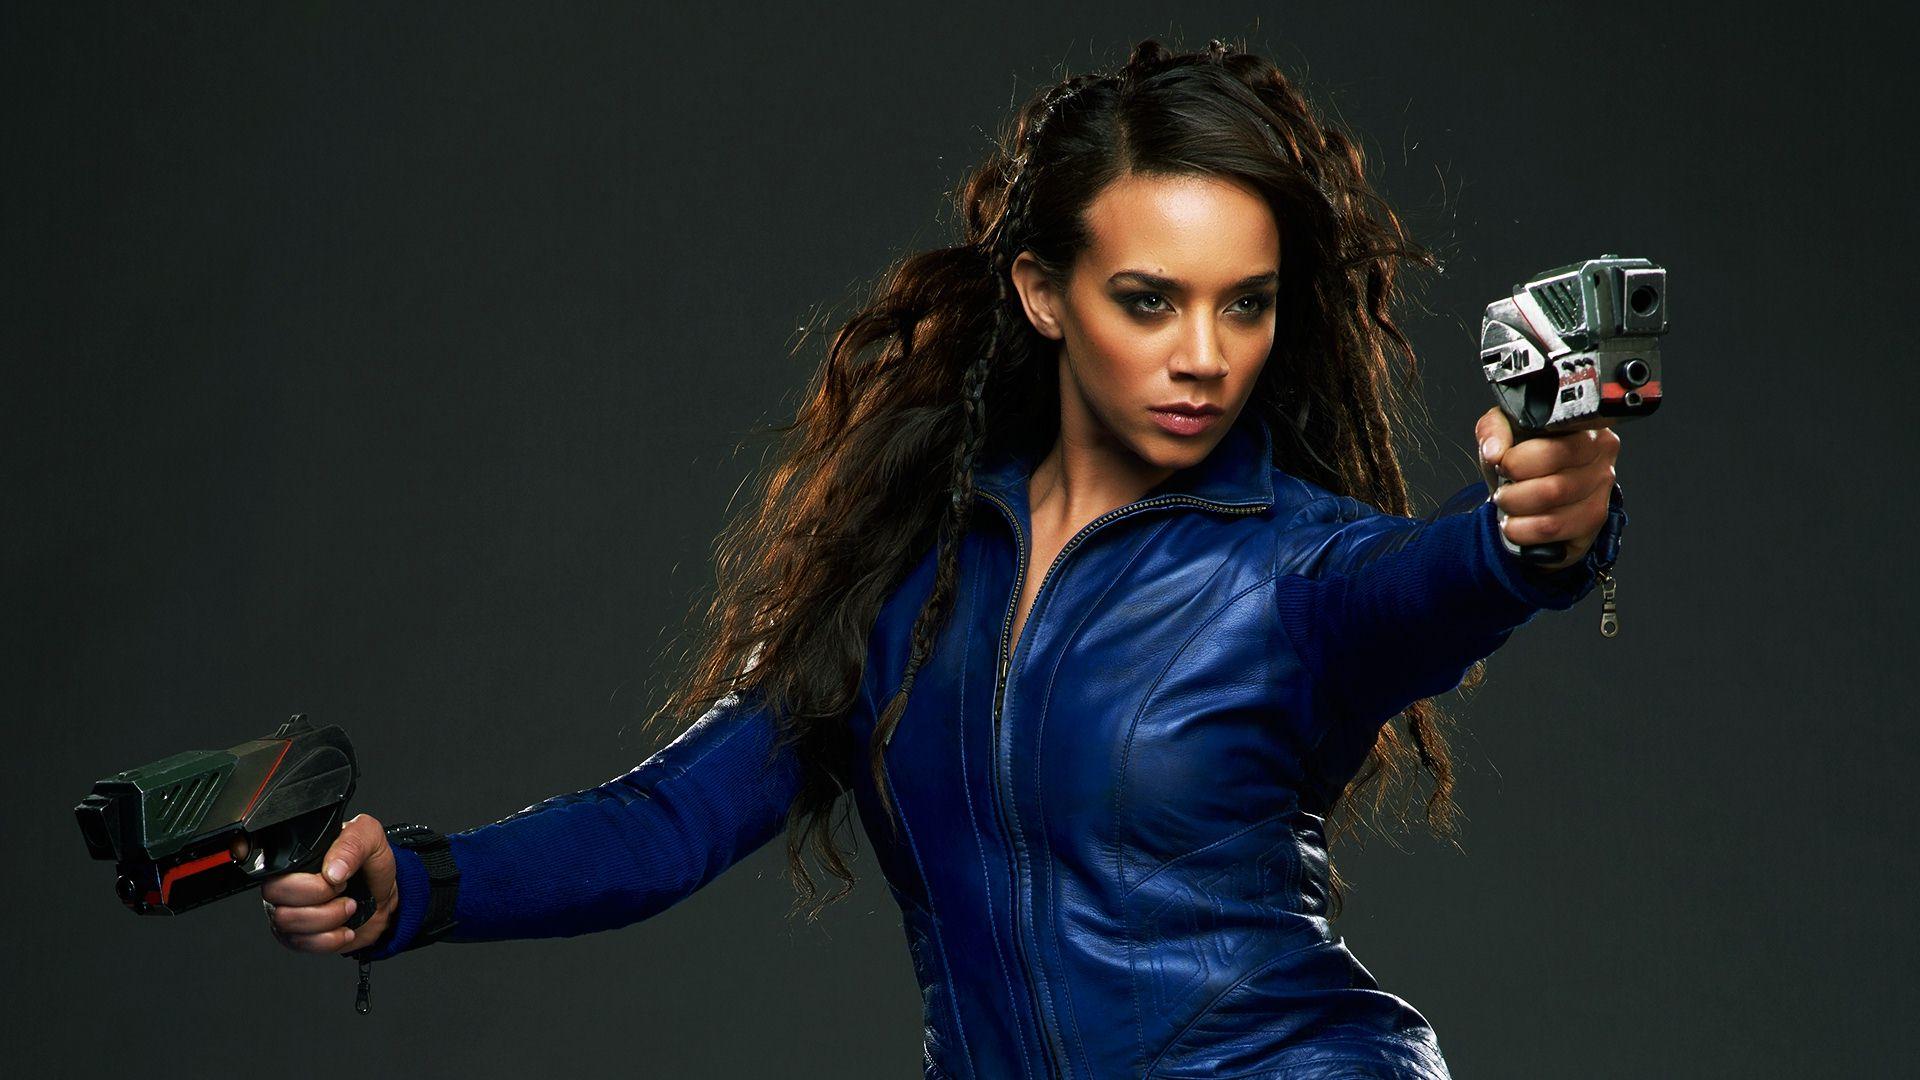 Hannah John-Kamen Joins Alicia Vikander In Tomb Raider